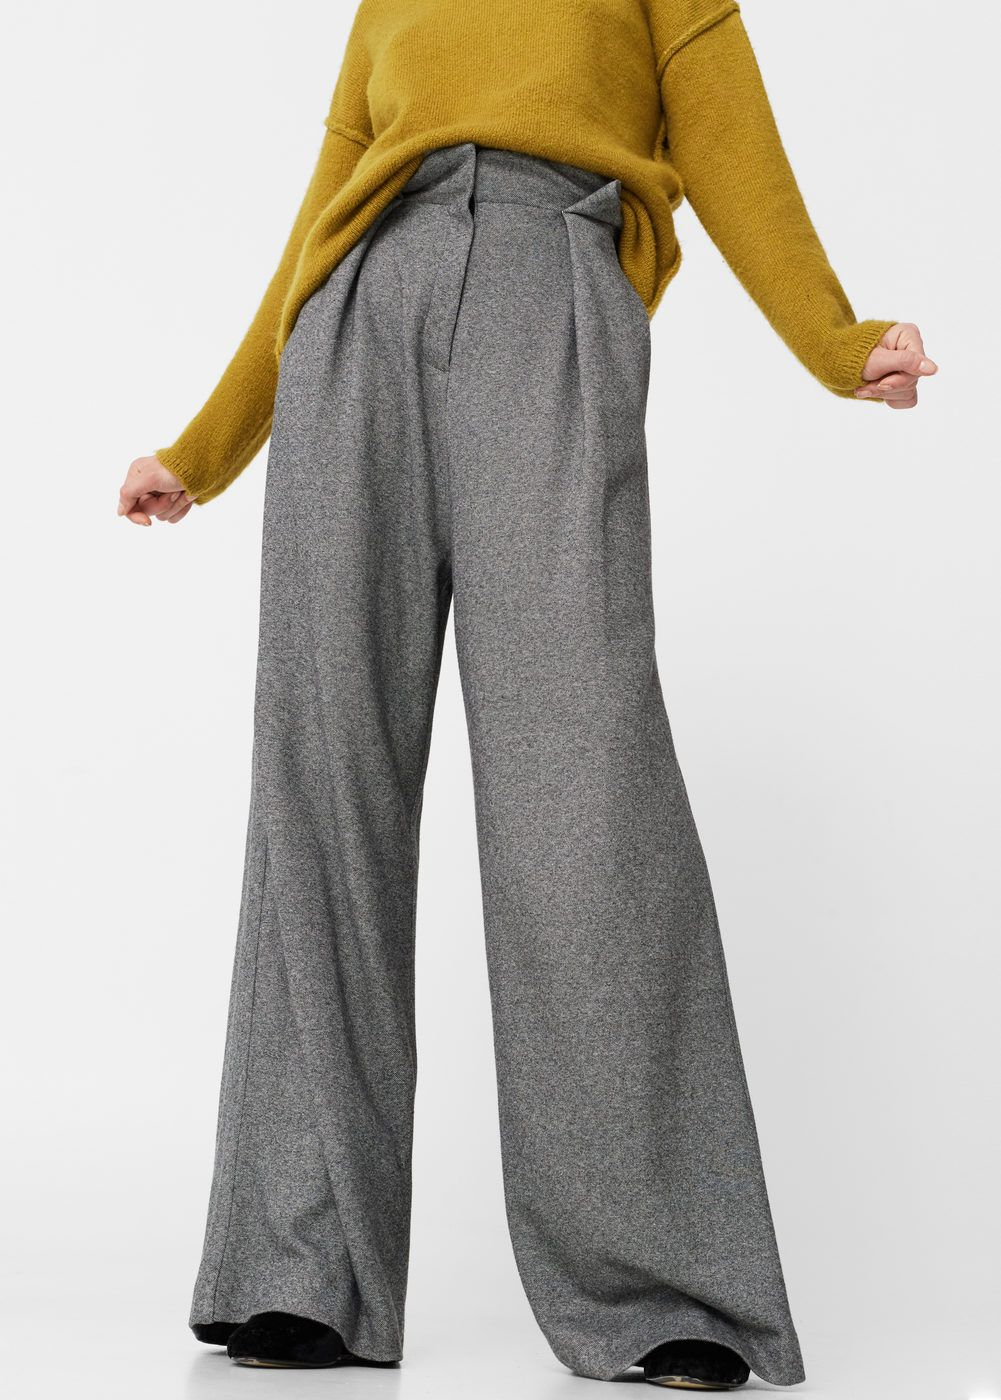 Haute Femme Look Palazzo Pantalons Taille Pantalon gqU4wEA